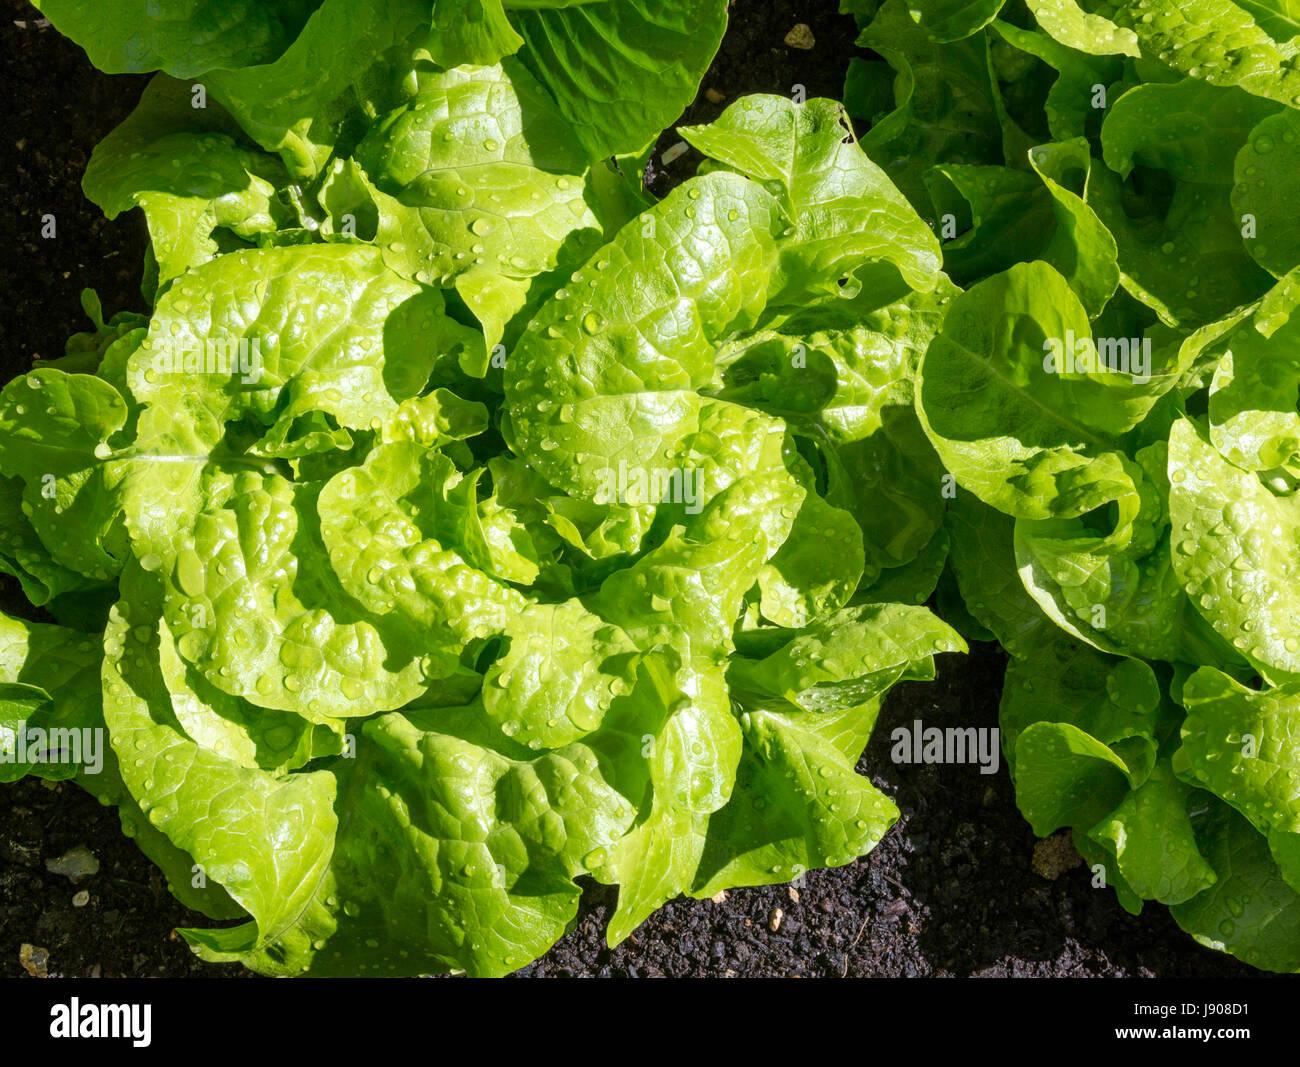 Salat Pflanzen Stockbild